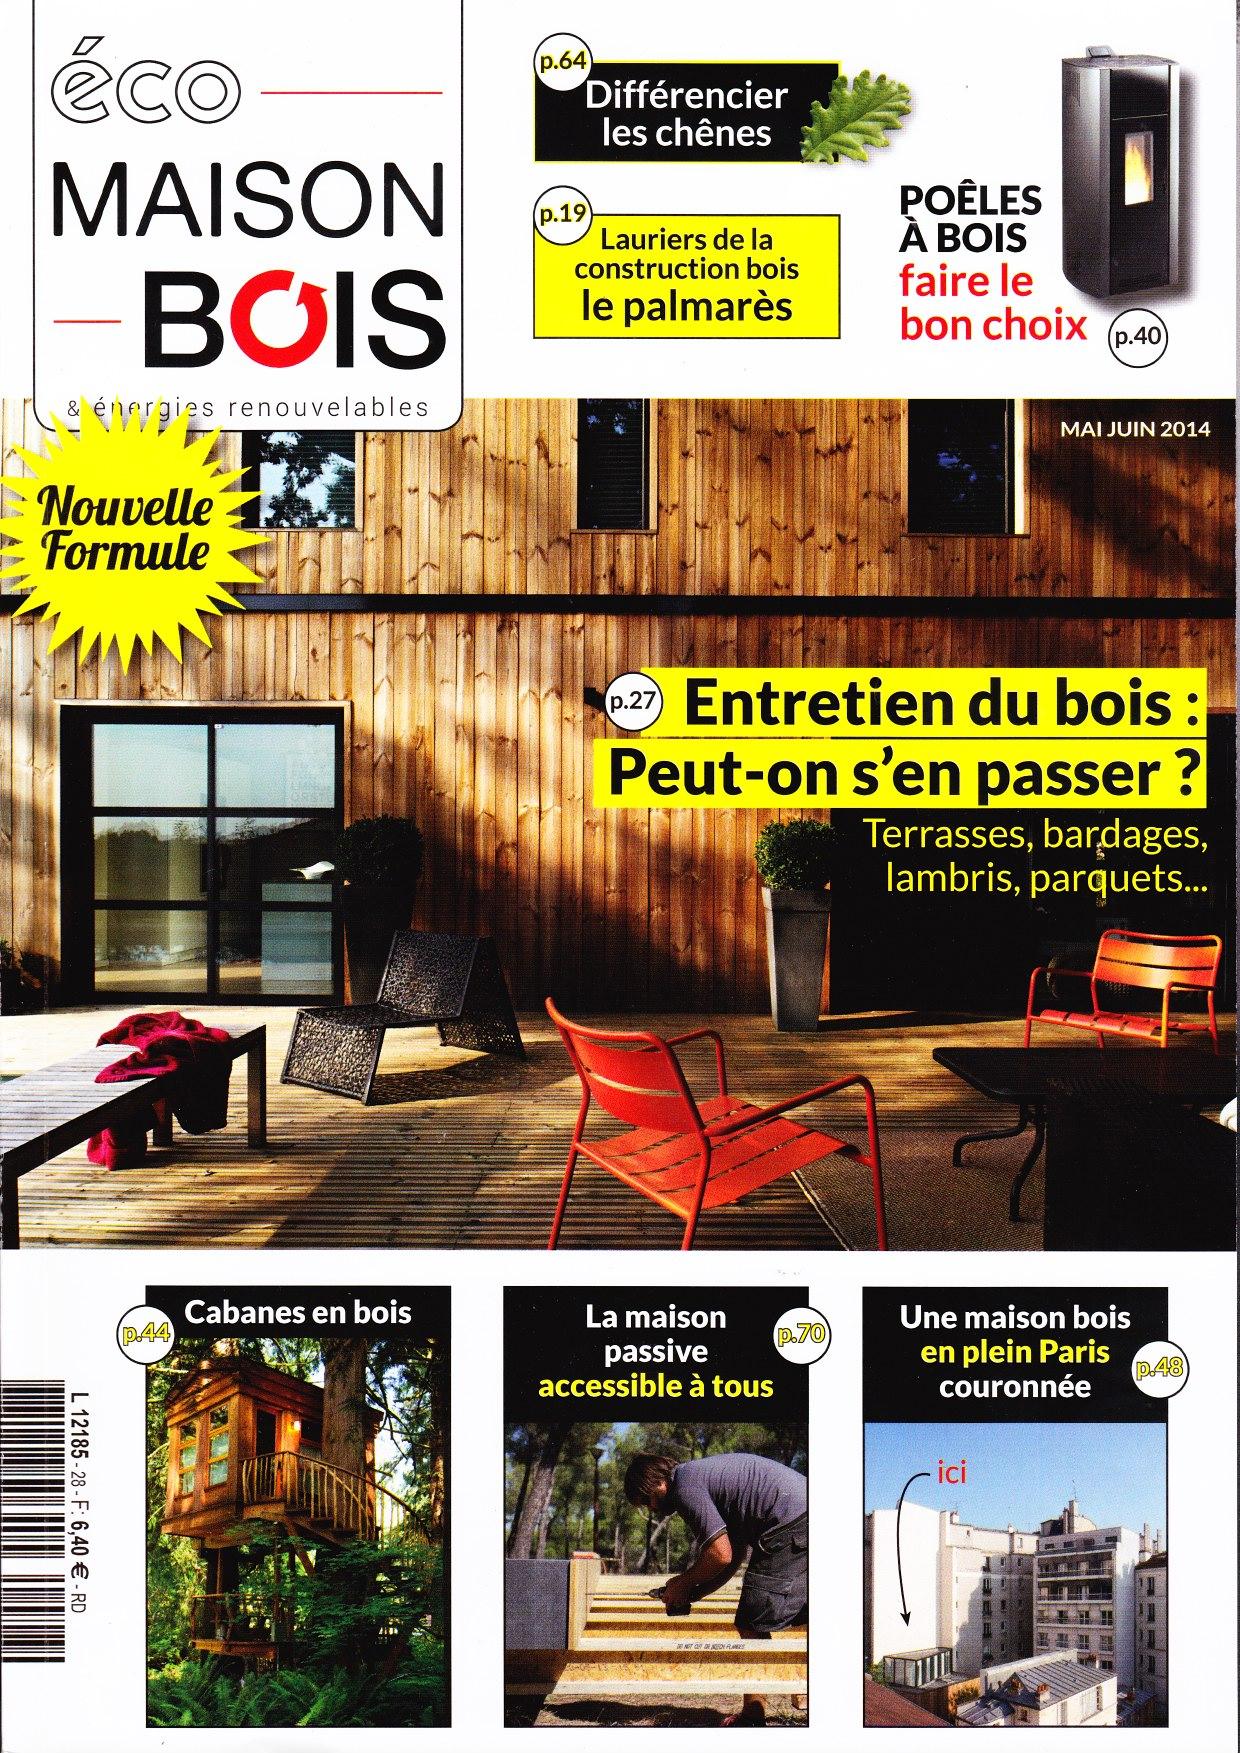 eco-maison-bois